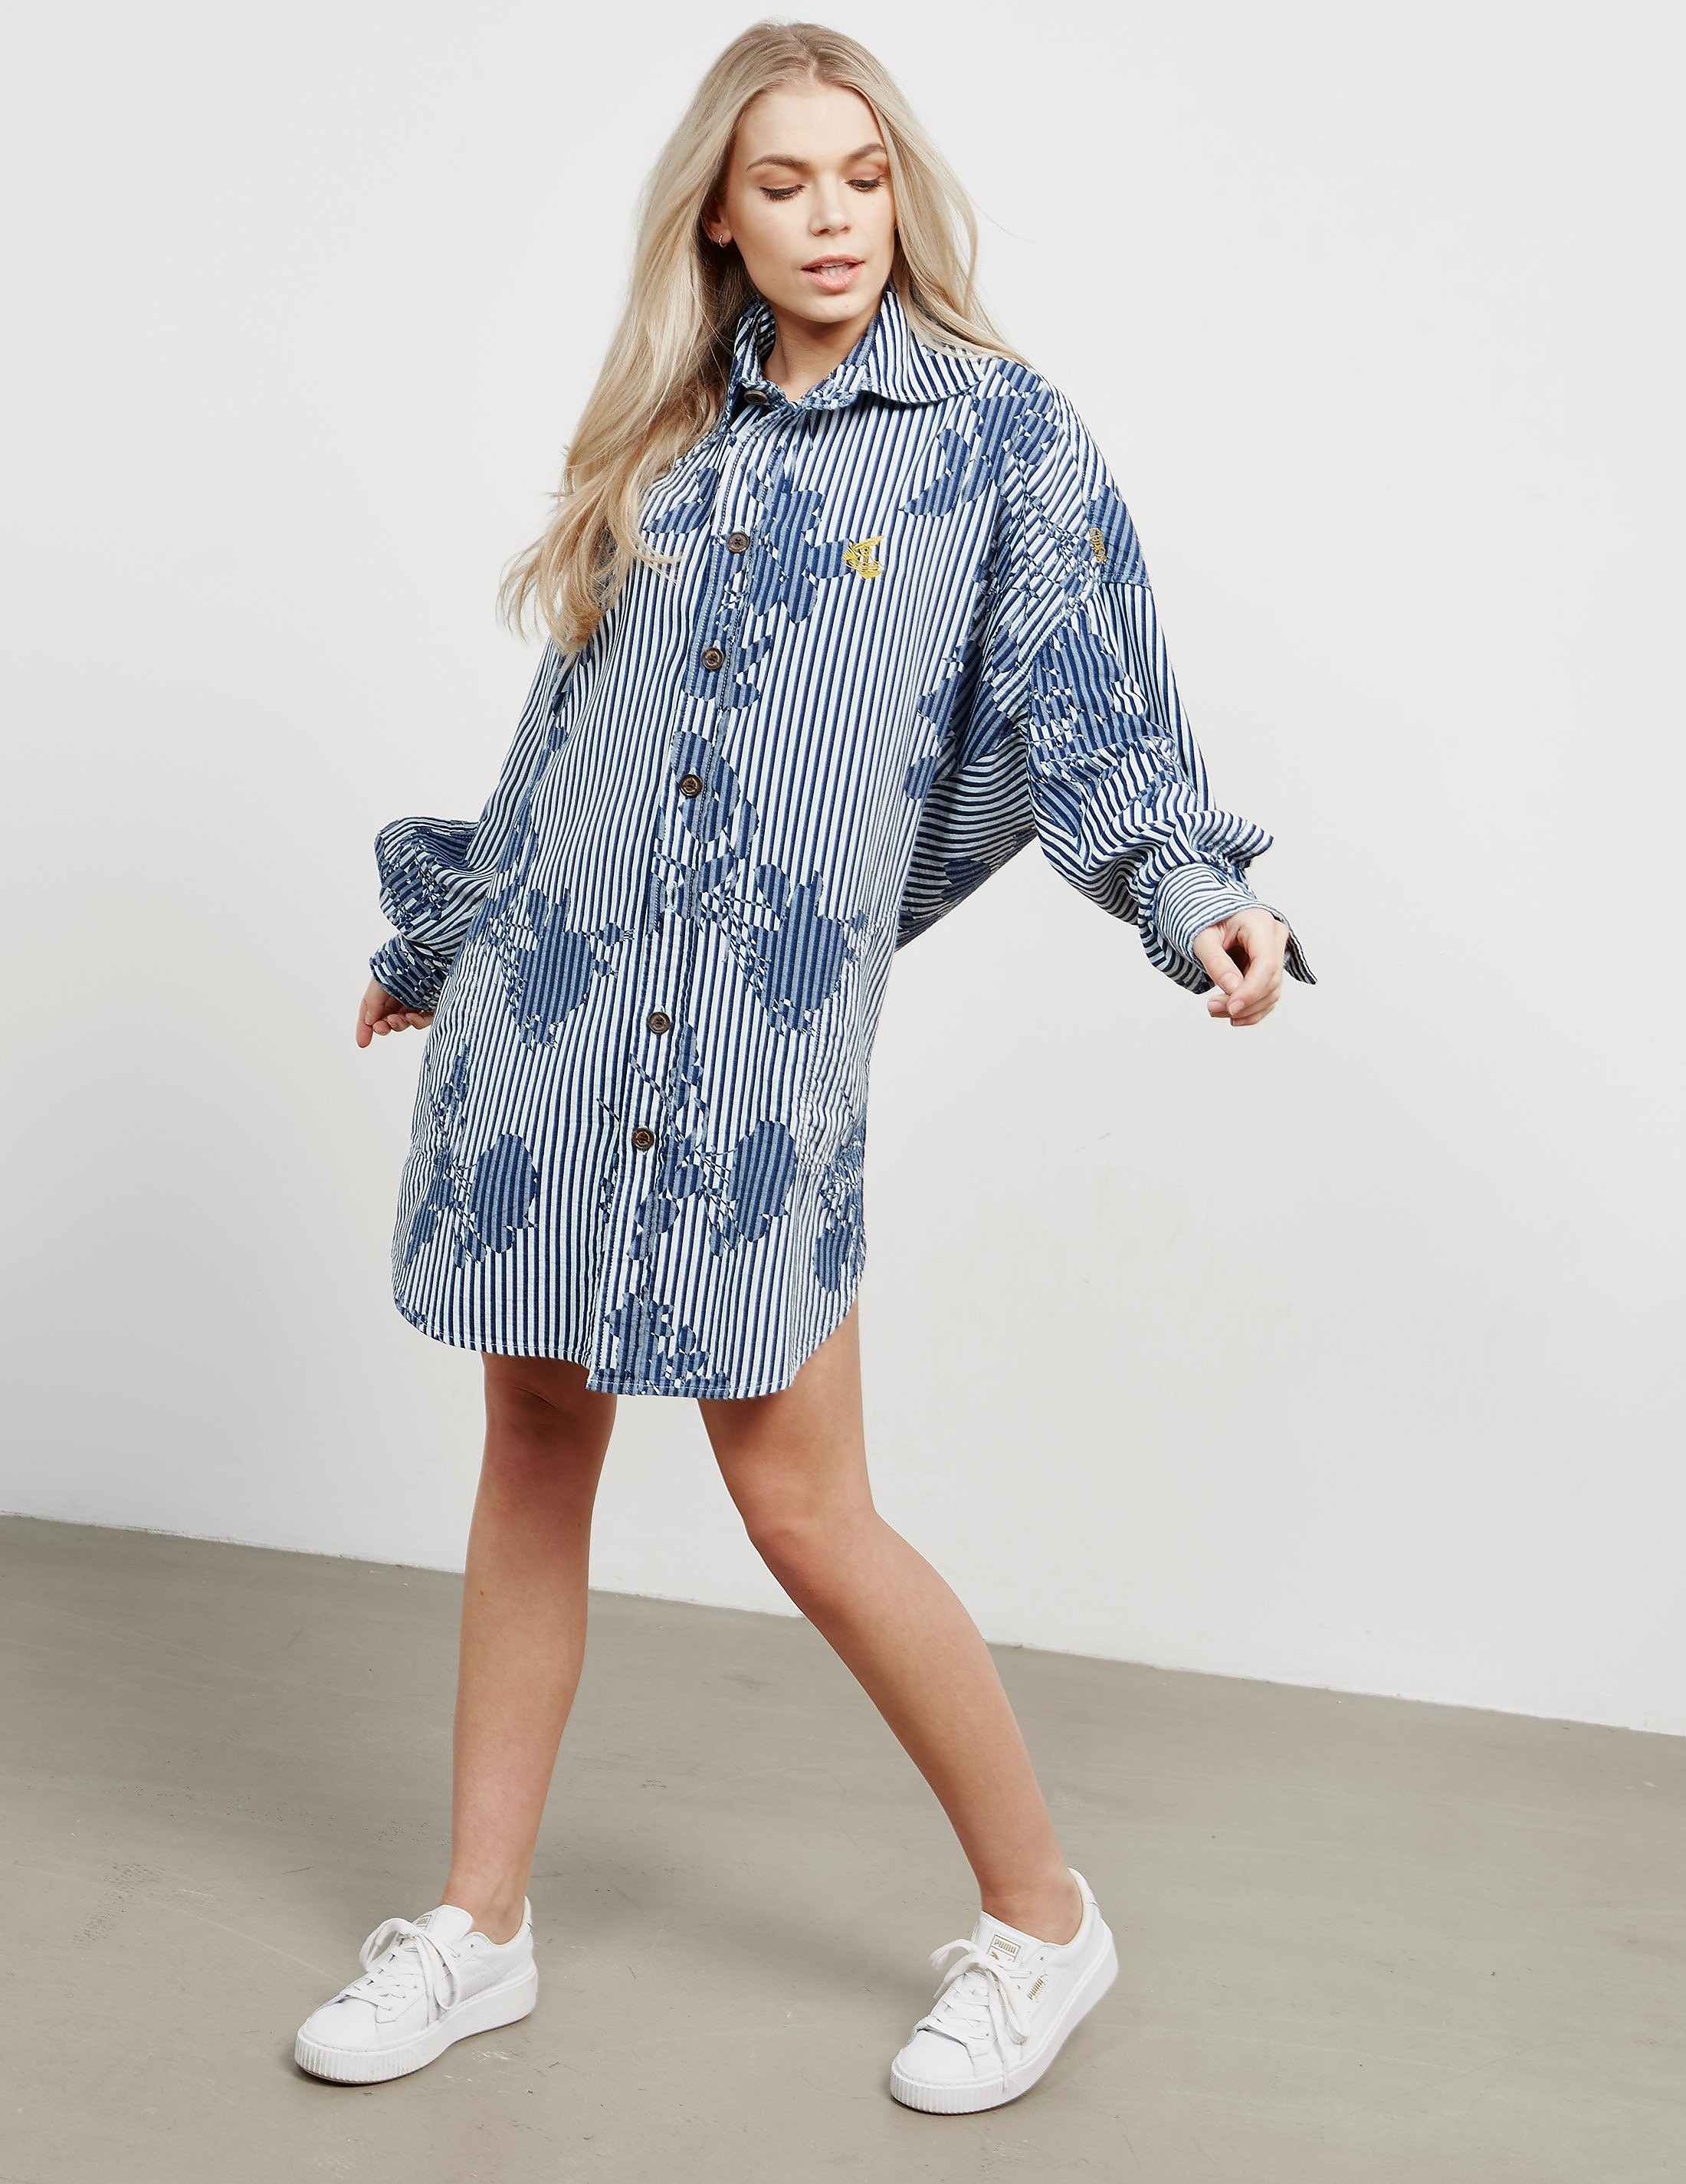 Vivienne Westwood Anglomania Chaos Shirt Dress